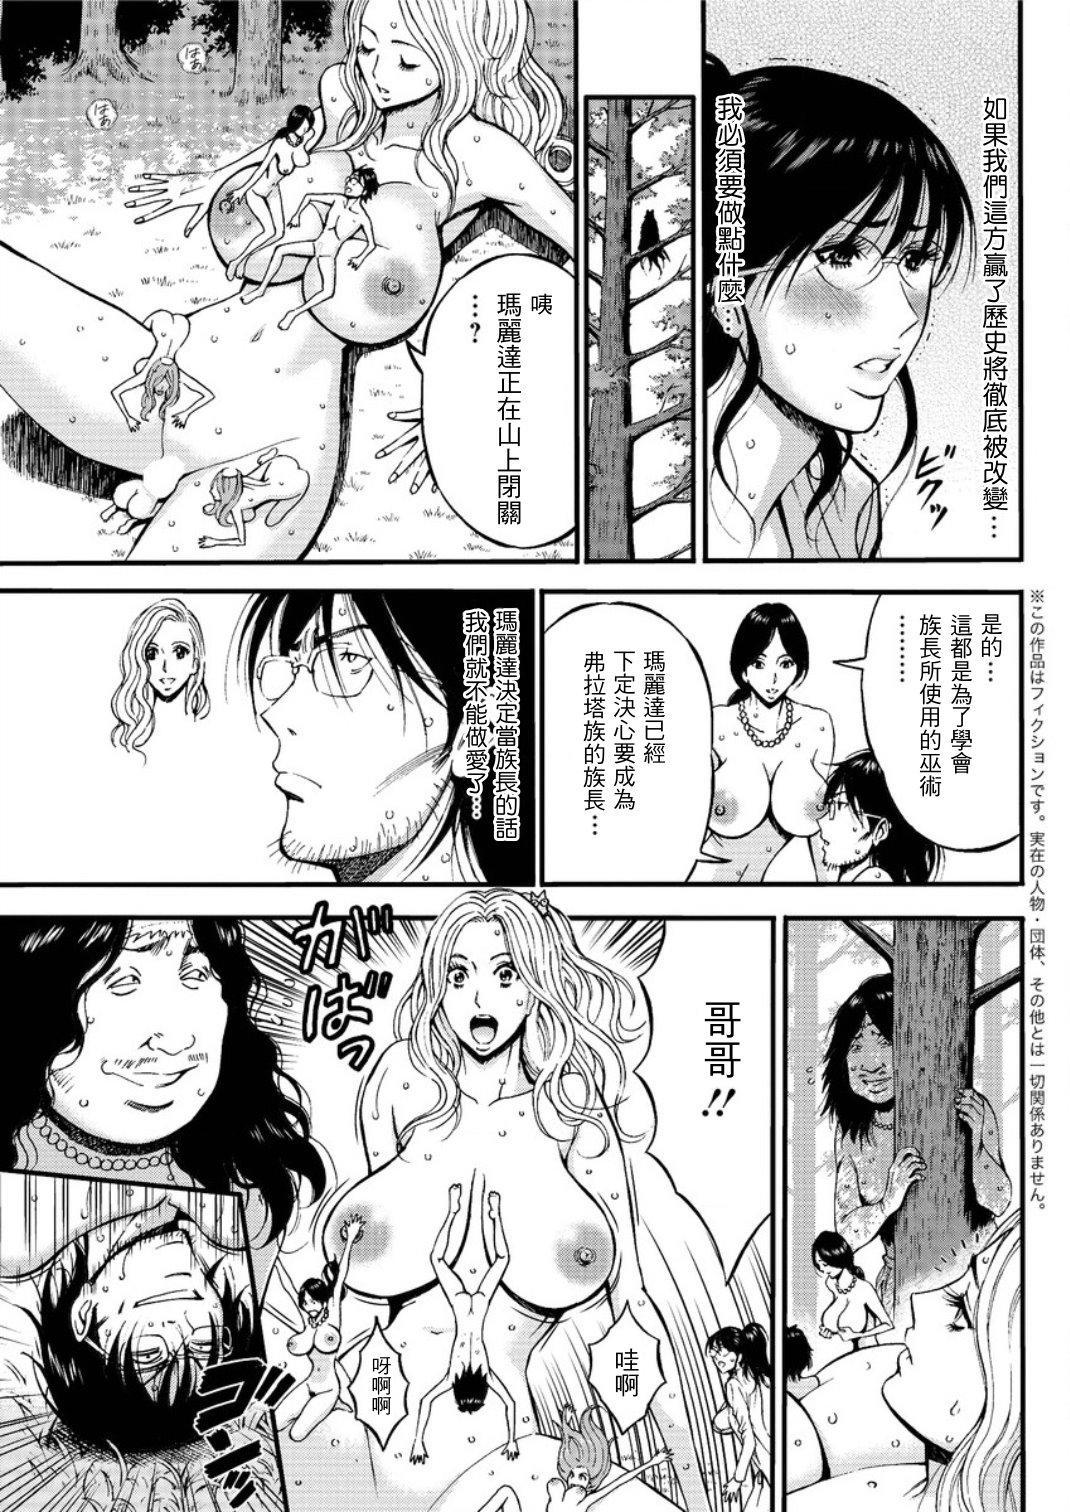 Kigenzen 10000 Nen no Ota | 史前一萬年的宅男 Ch. 19-24 59